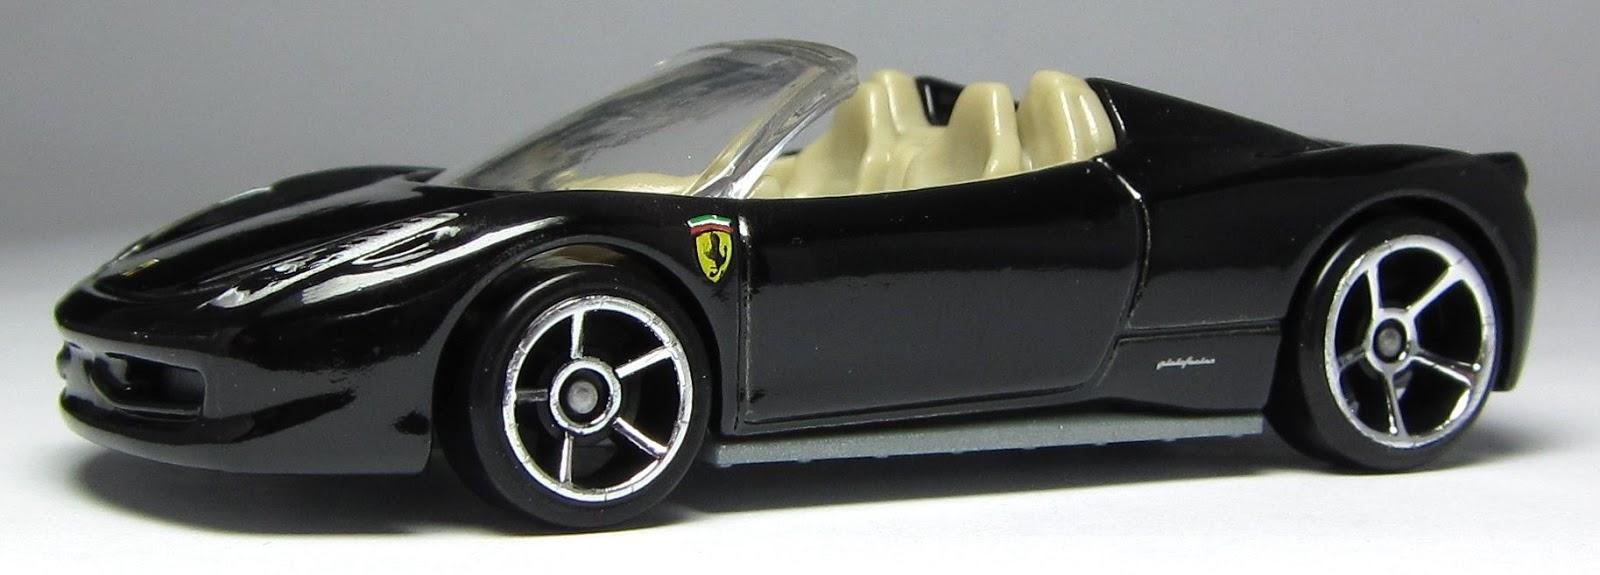 Car Lamley Group Making Sense Of The 2013 Ferrari 458